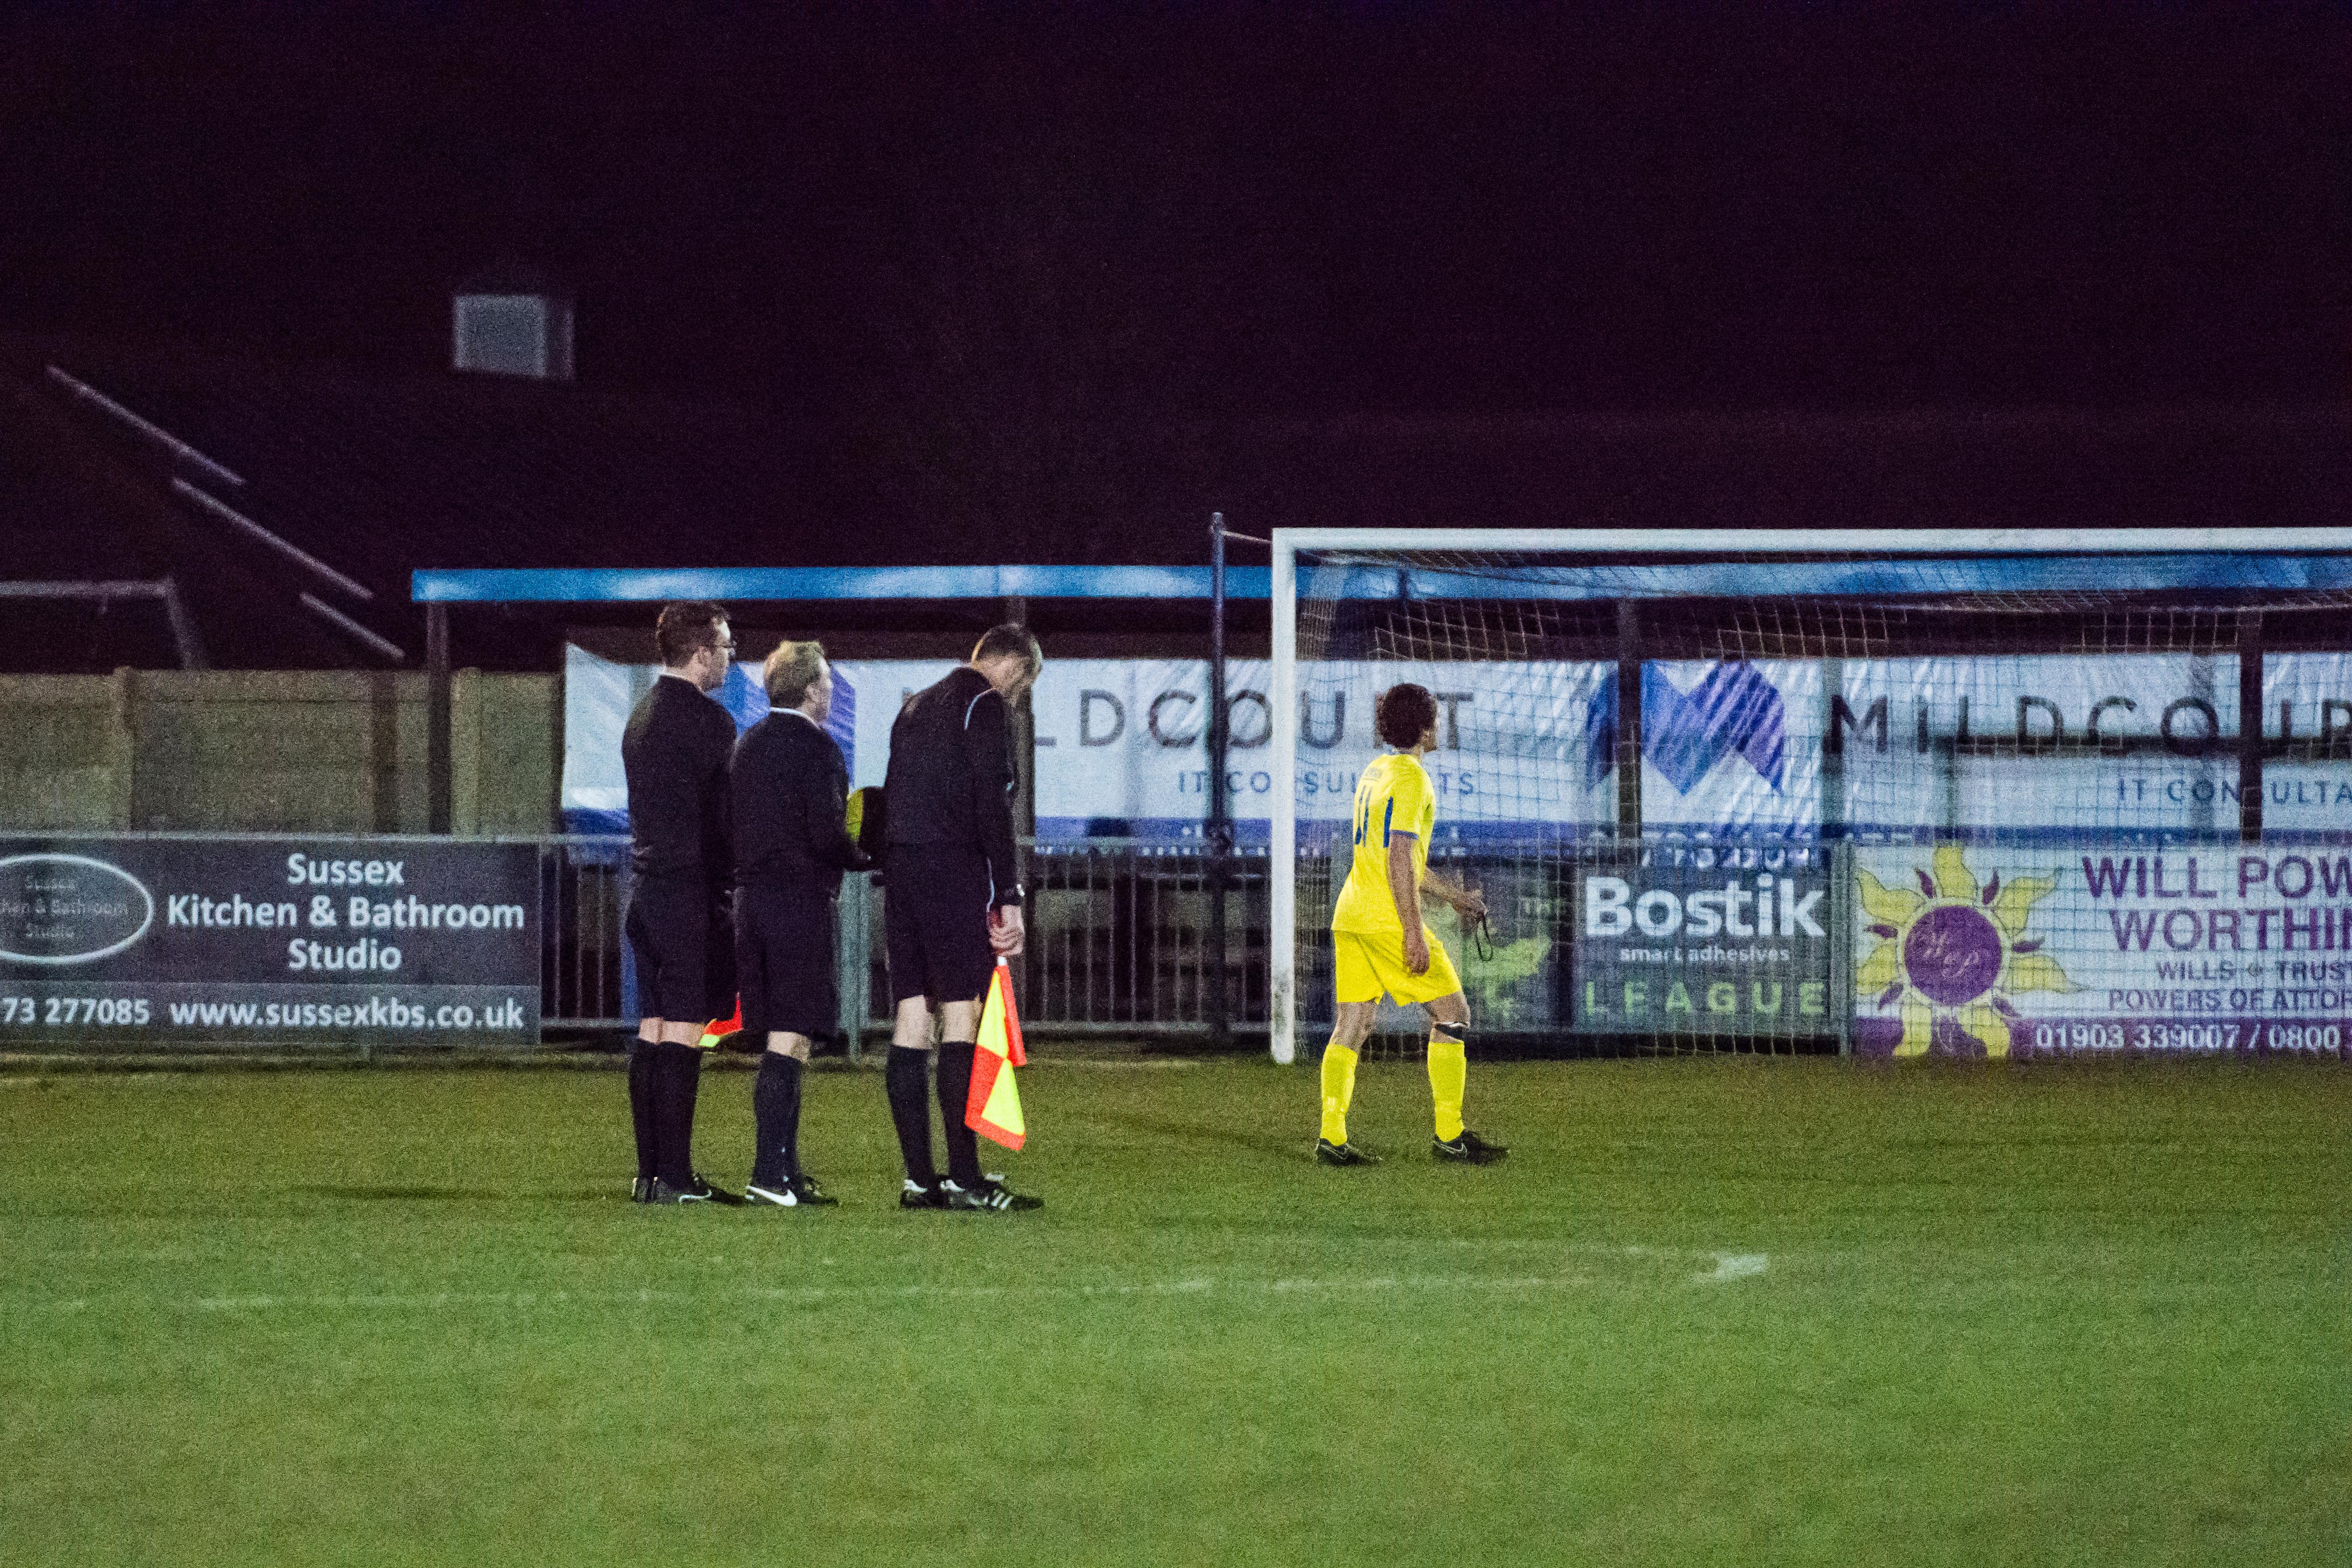 DAVID_JEFFERY Shoreham FC U18s vs Woking FC Academy 22.03.18 47